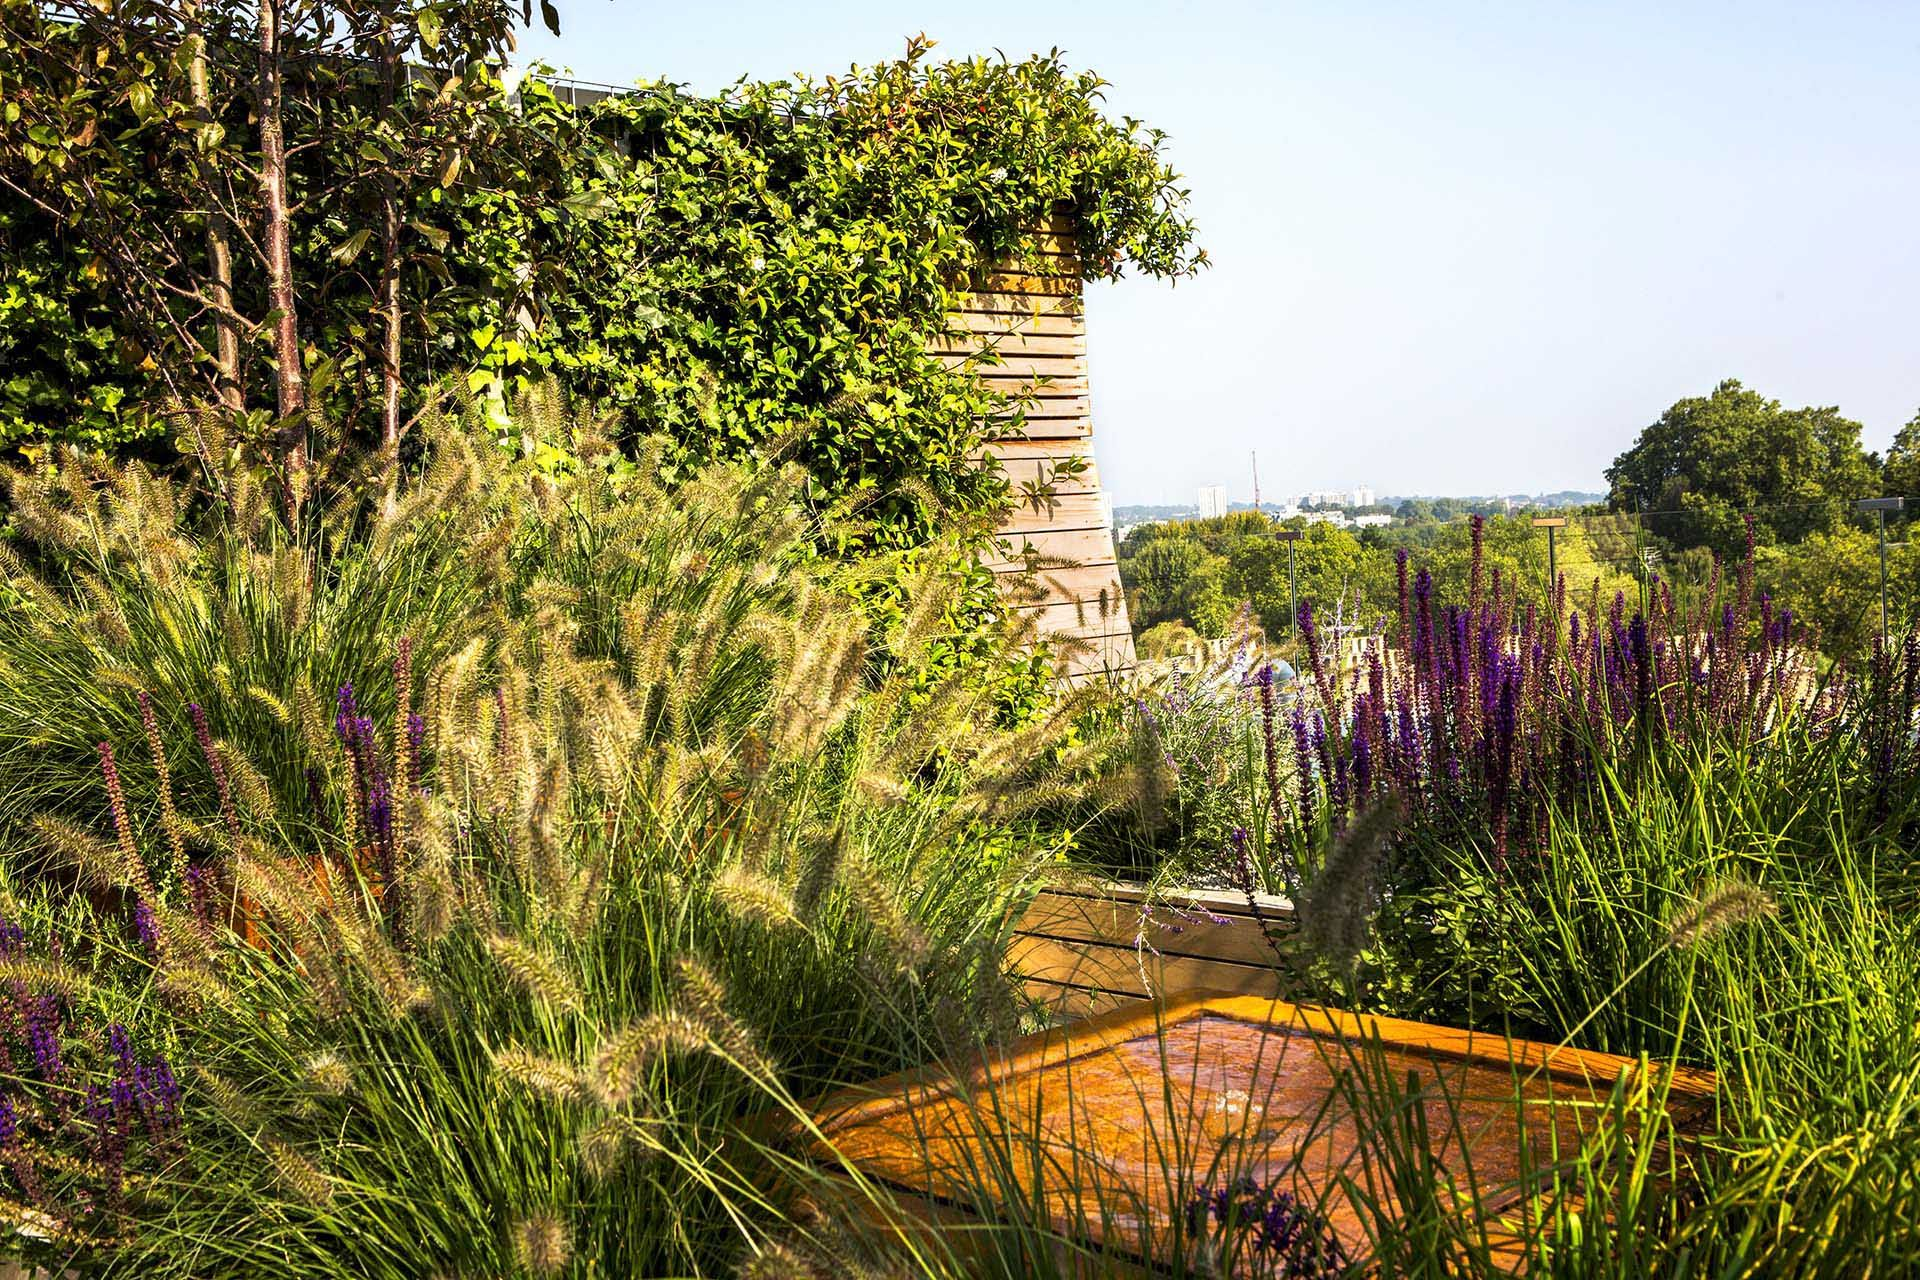 adolfo harrison / allsop place rooftop garden, regent's park